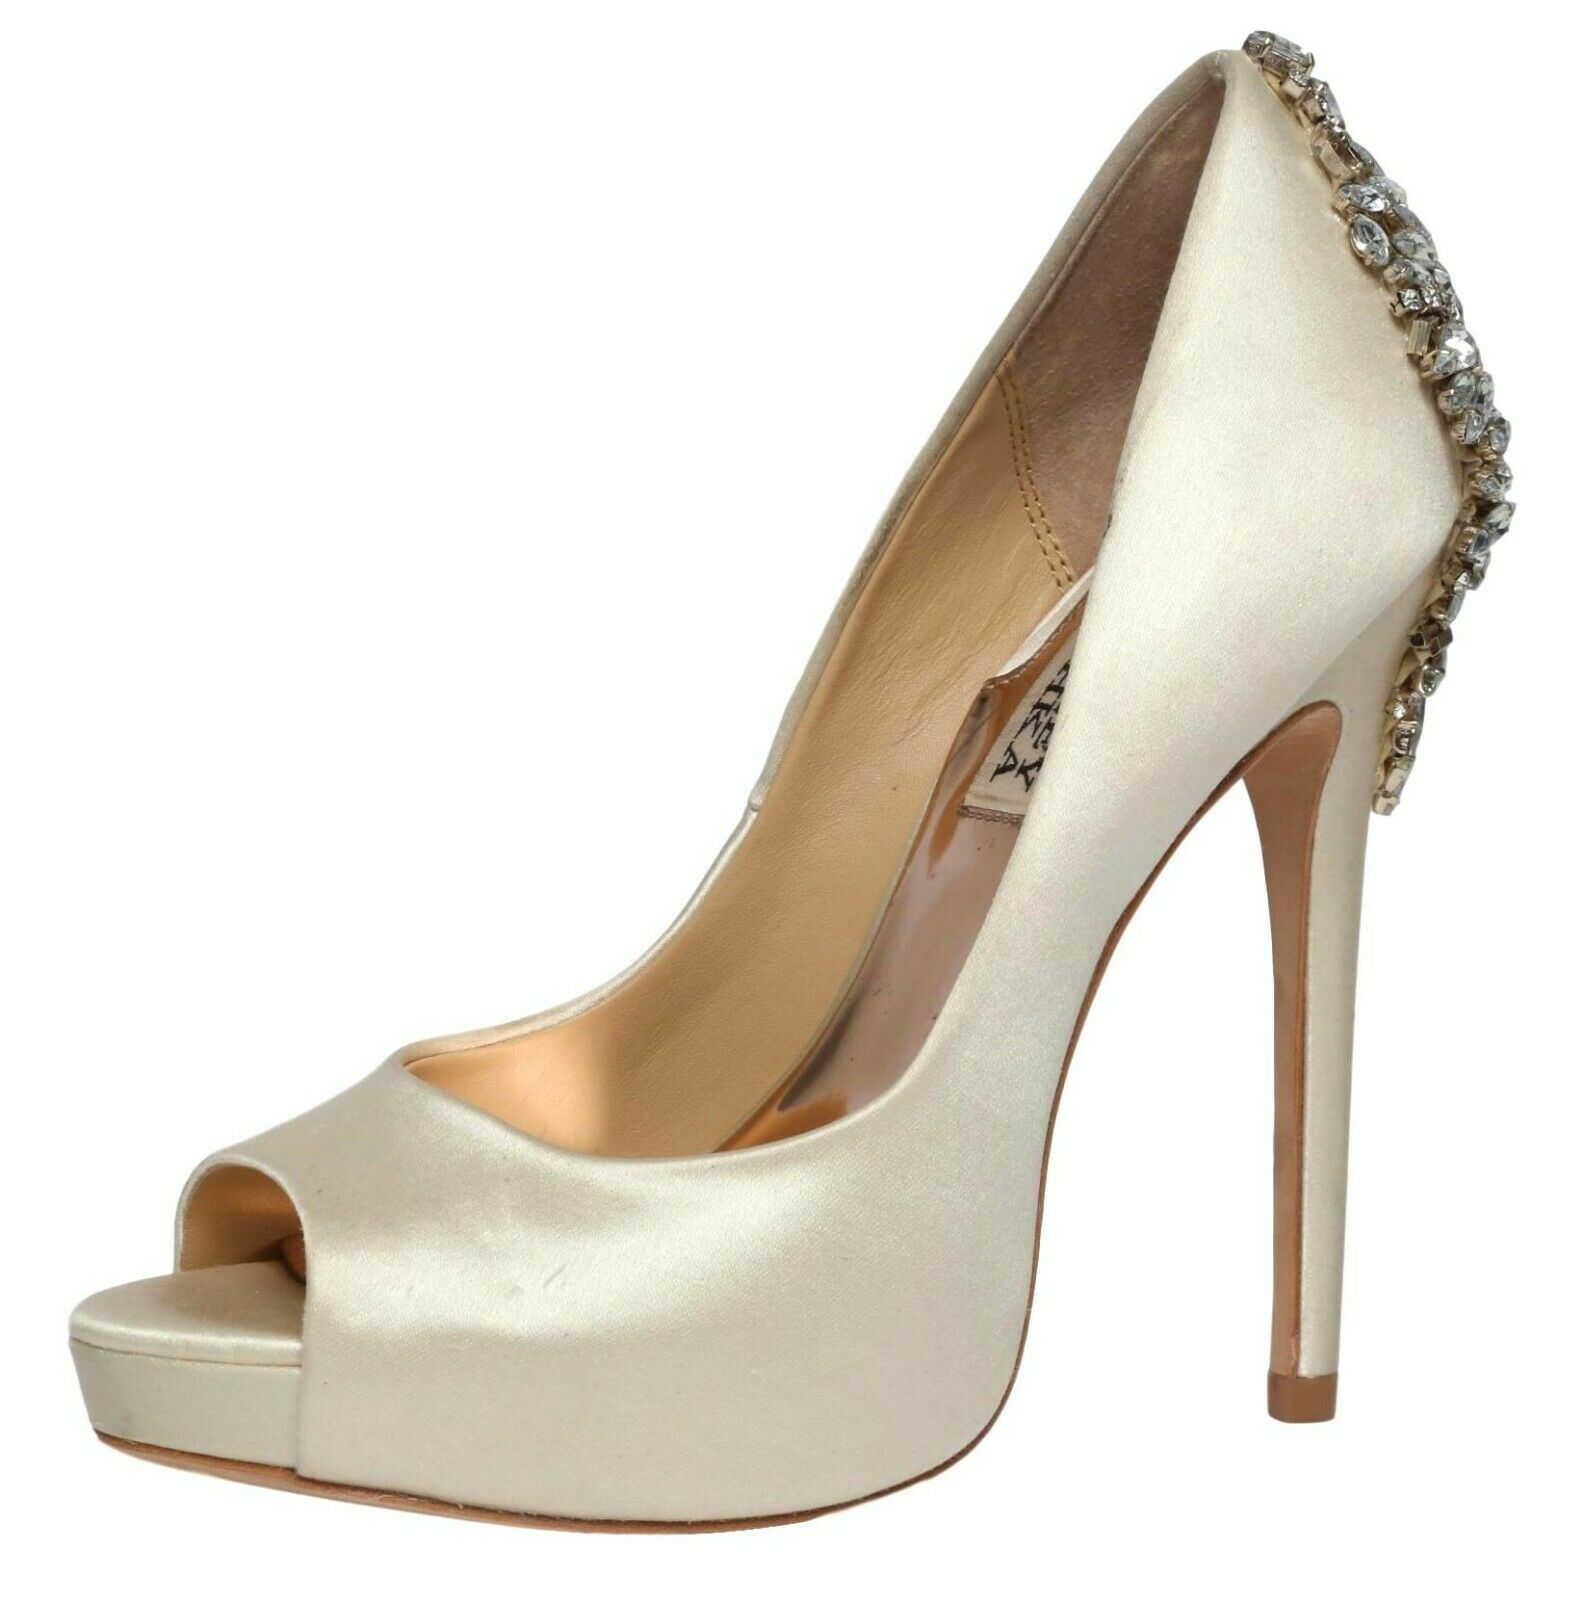 Badgley Mischka Womens Kiara Crystal Back Open Toe Pump Sz 5 M 3126